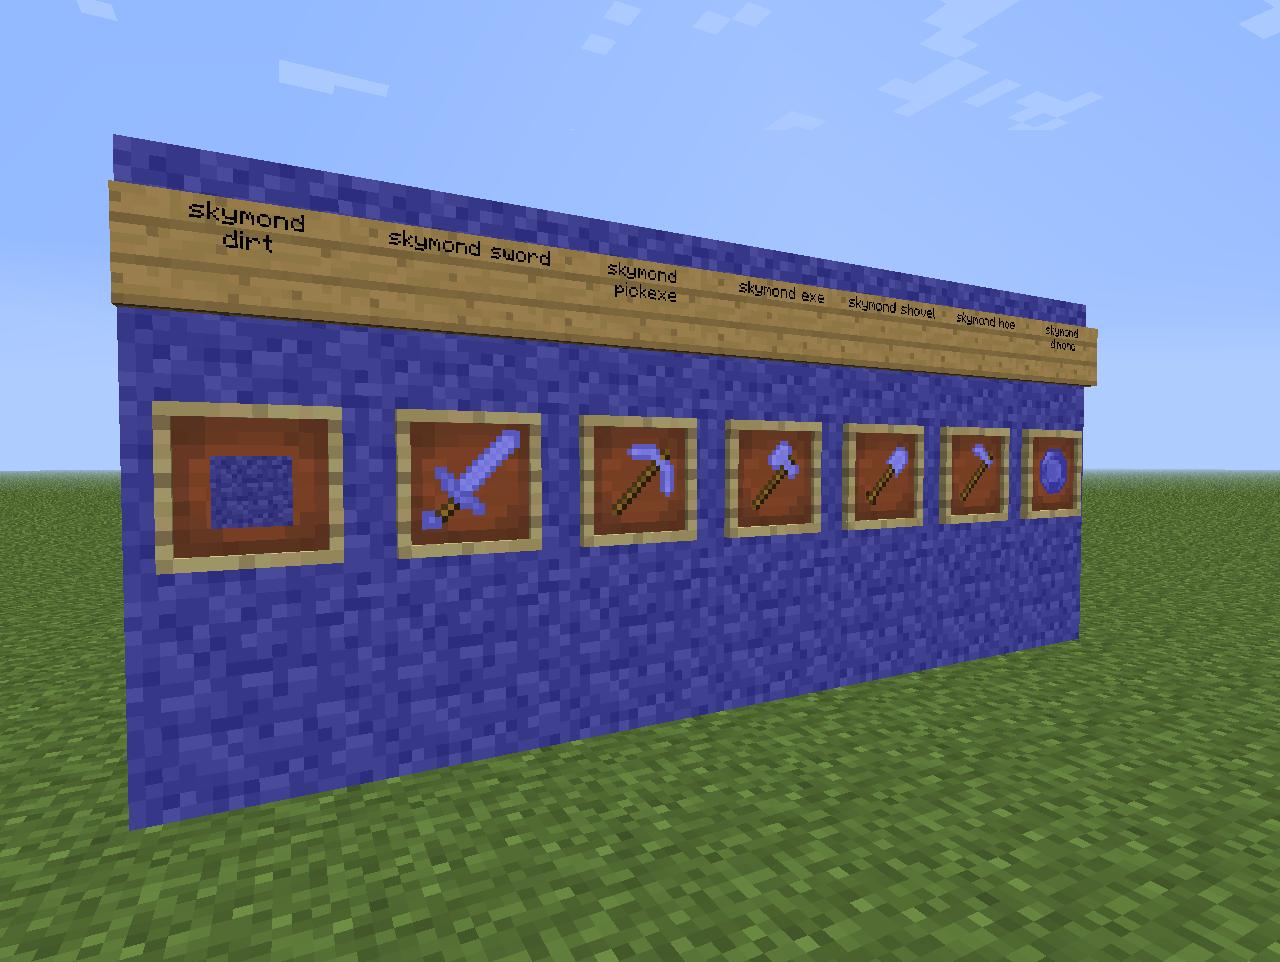 skymond mod for Minecraft Mod DB